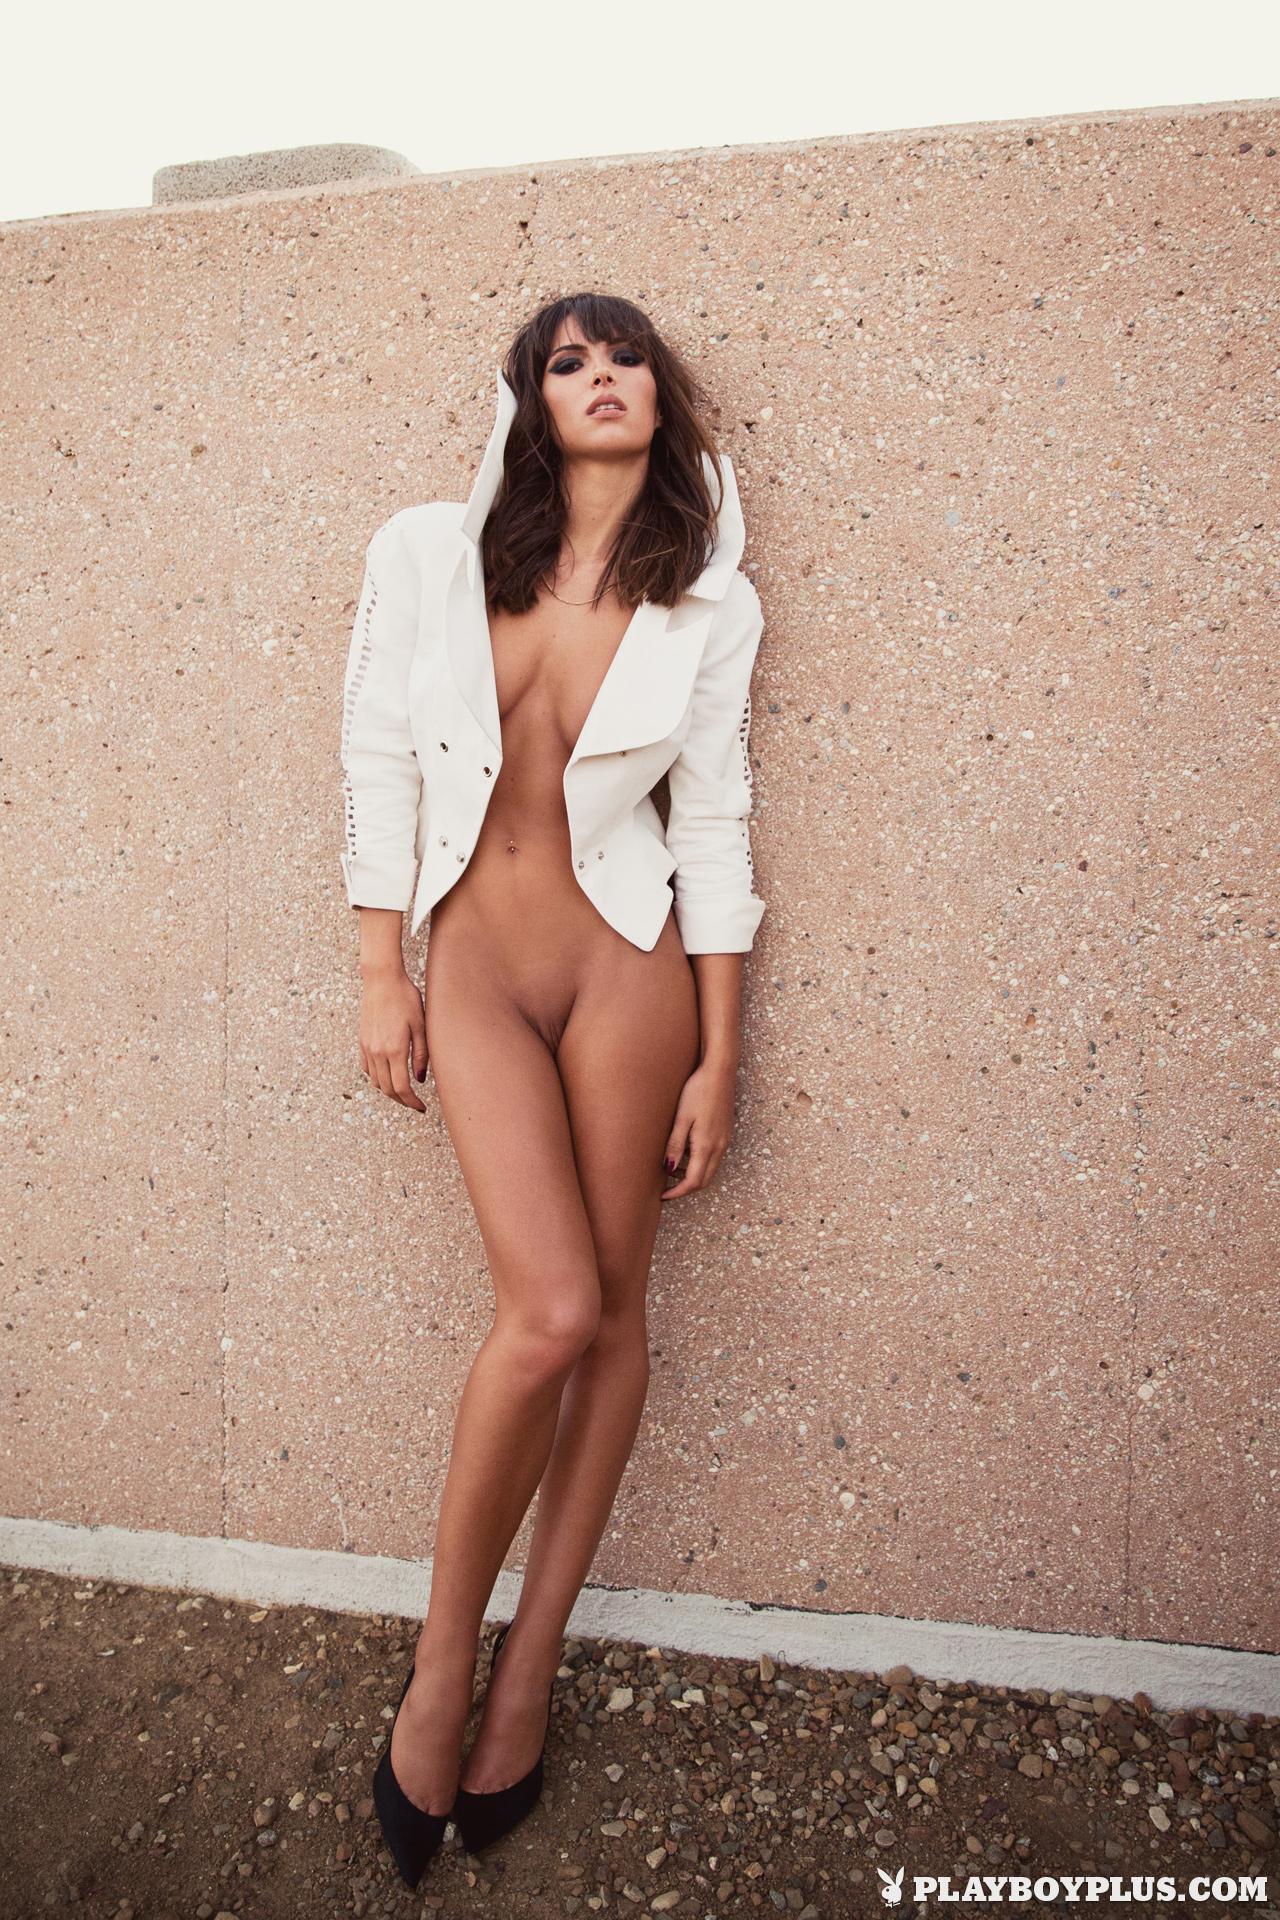 Silvia saint full nude body